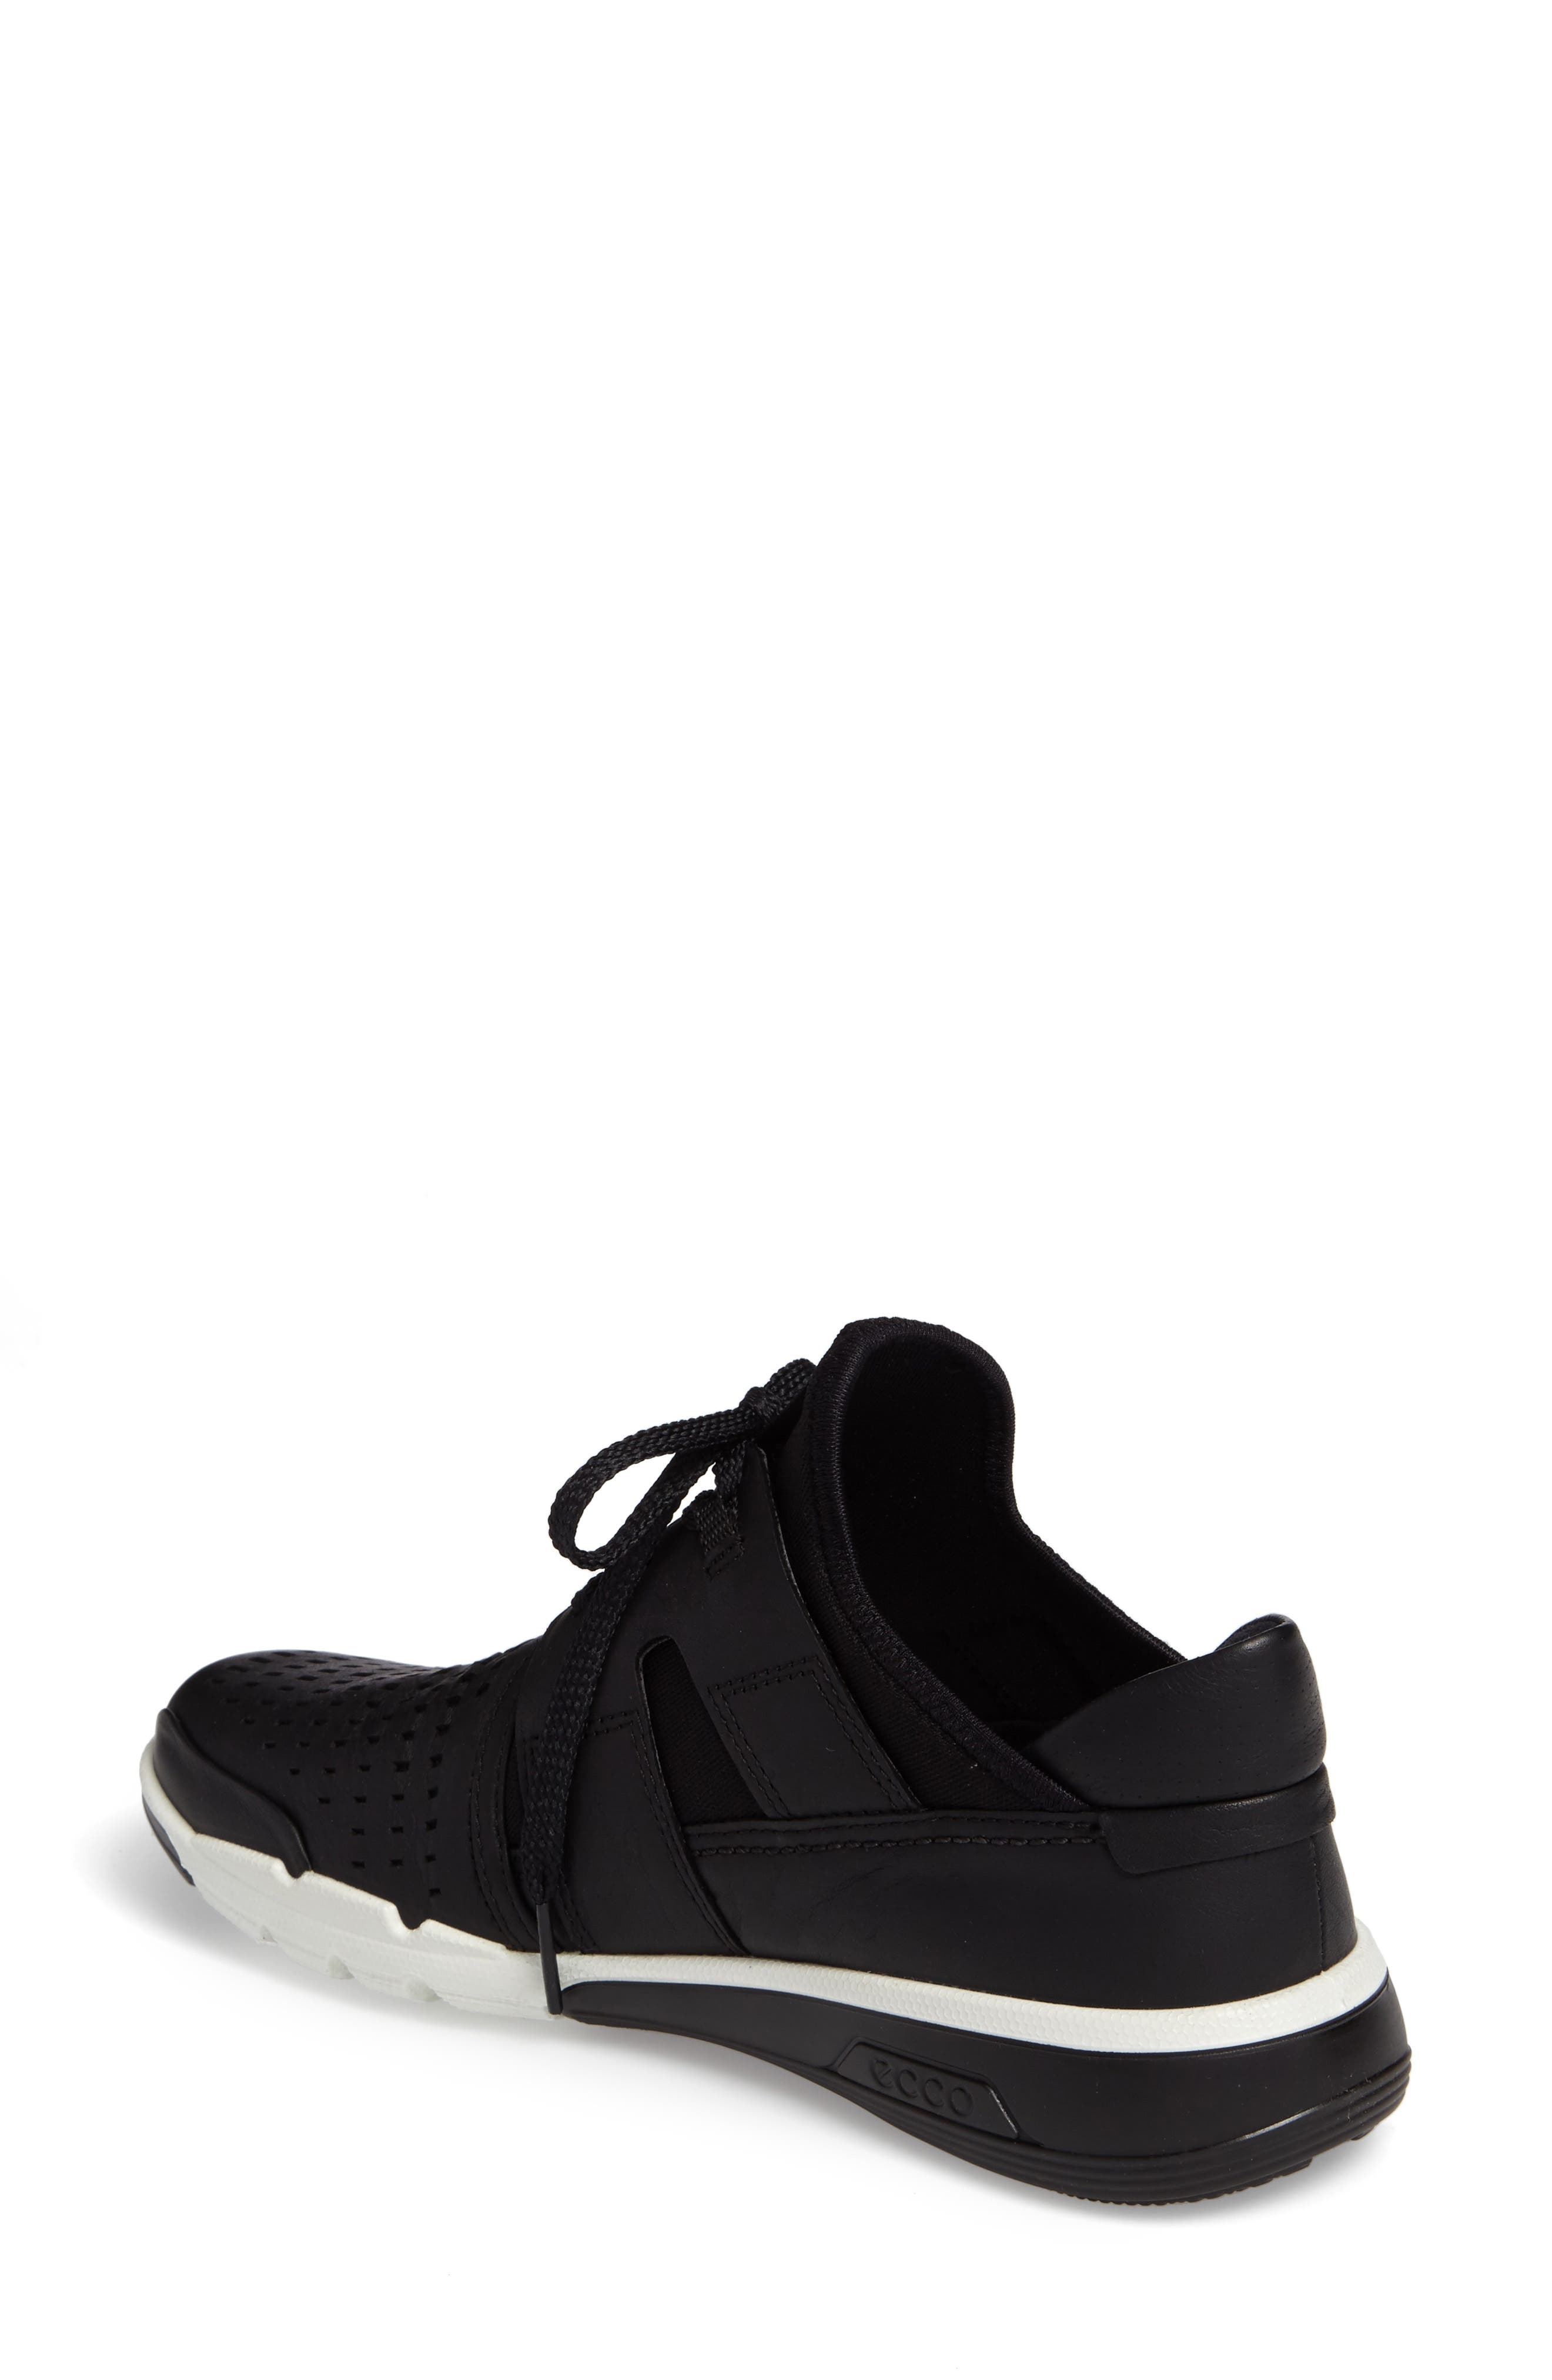 Alternate Image 2  - ECCO Intrinsic 2 Sneaker (Women)